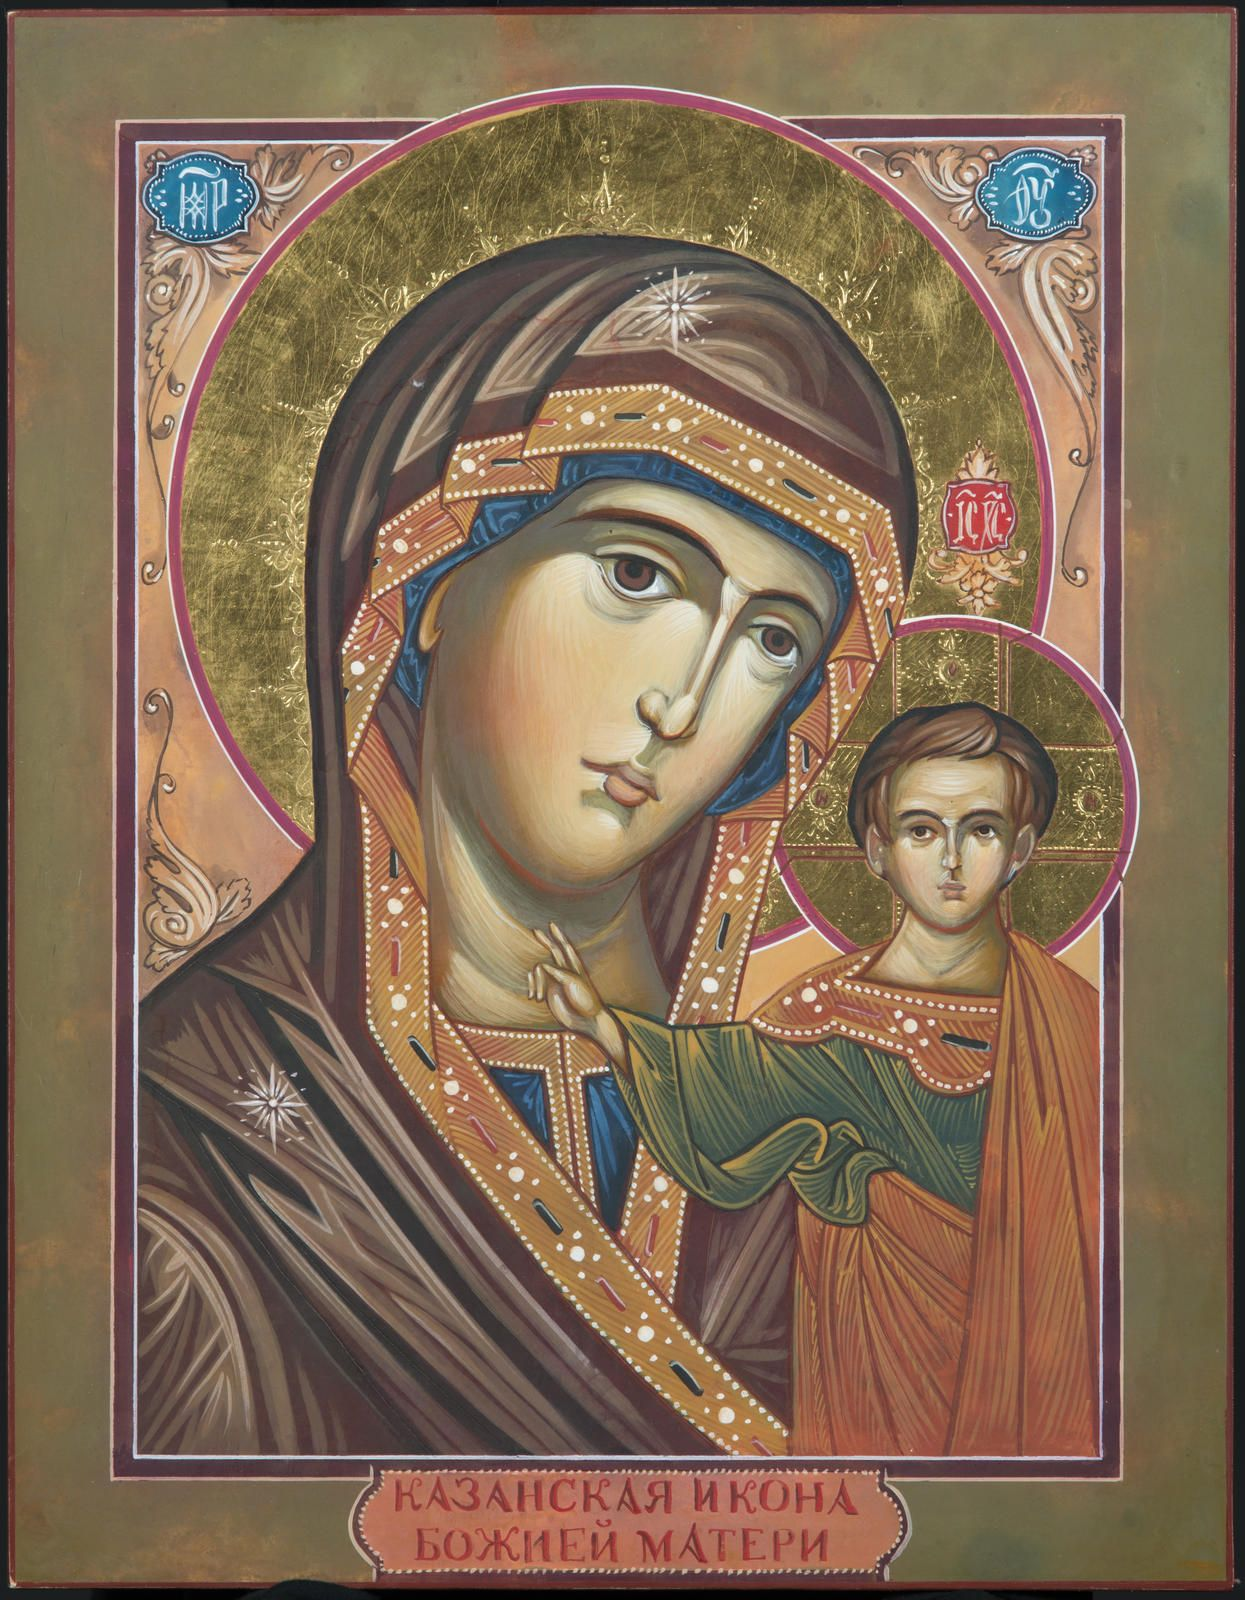 Holy Transfiguration Monastery - Icons